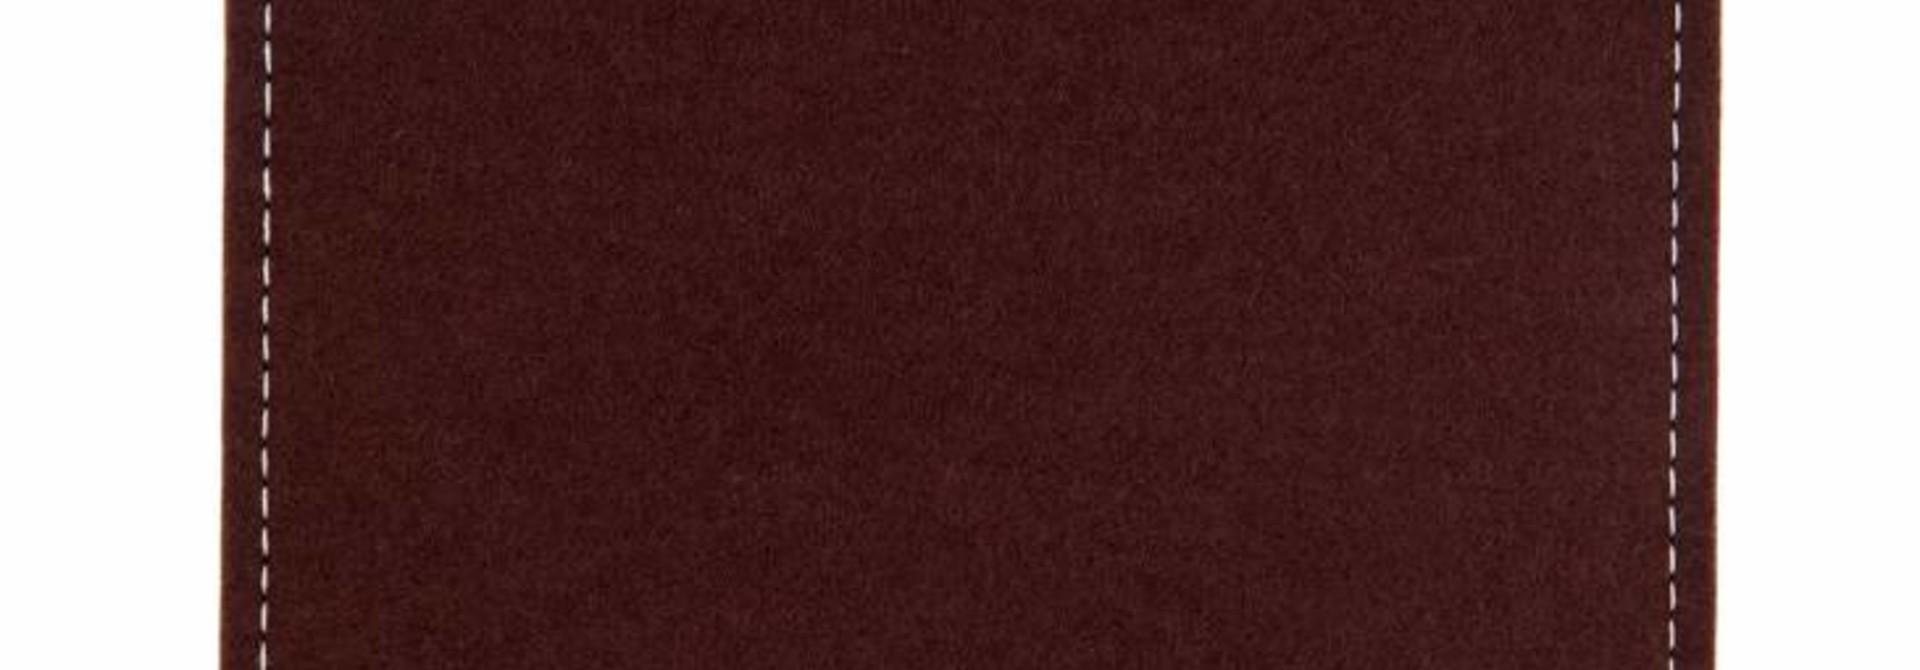 Portable SSD Sleeve Dark-Brown